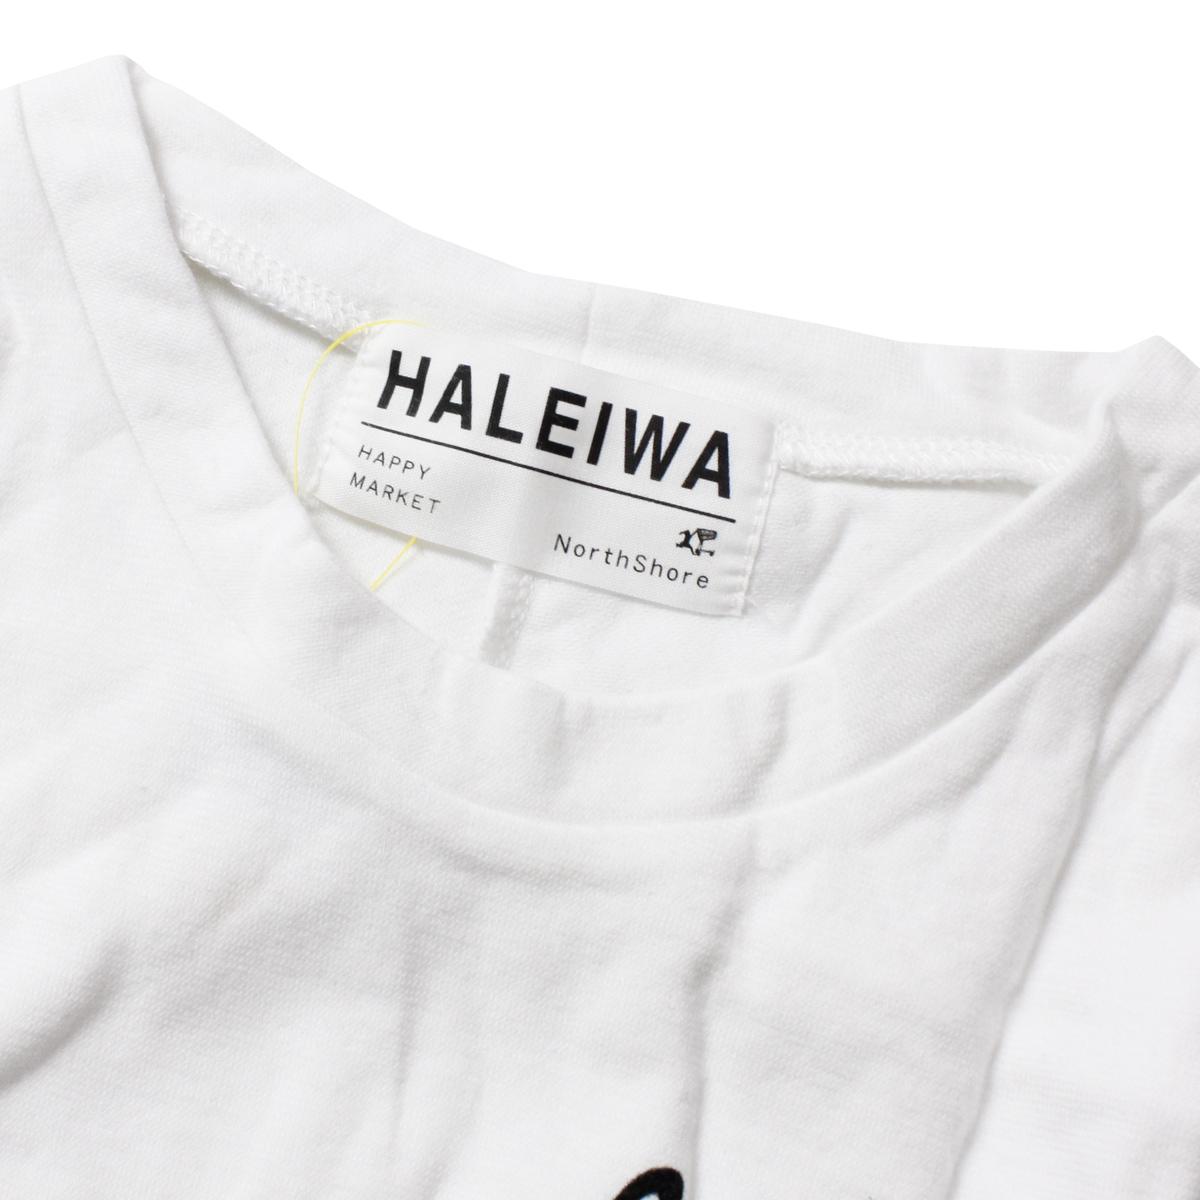 HALEIWA ハレイワ 接結 SHORT LS